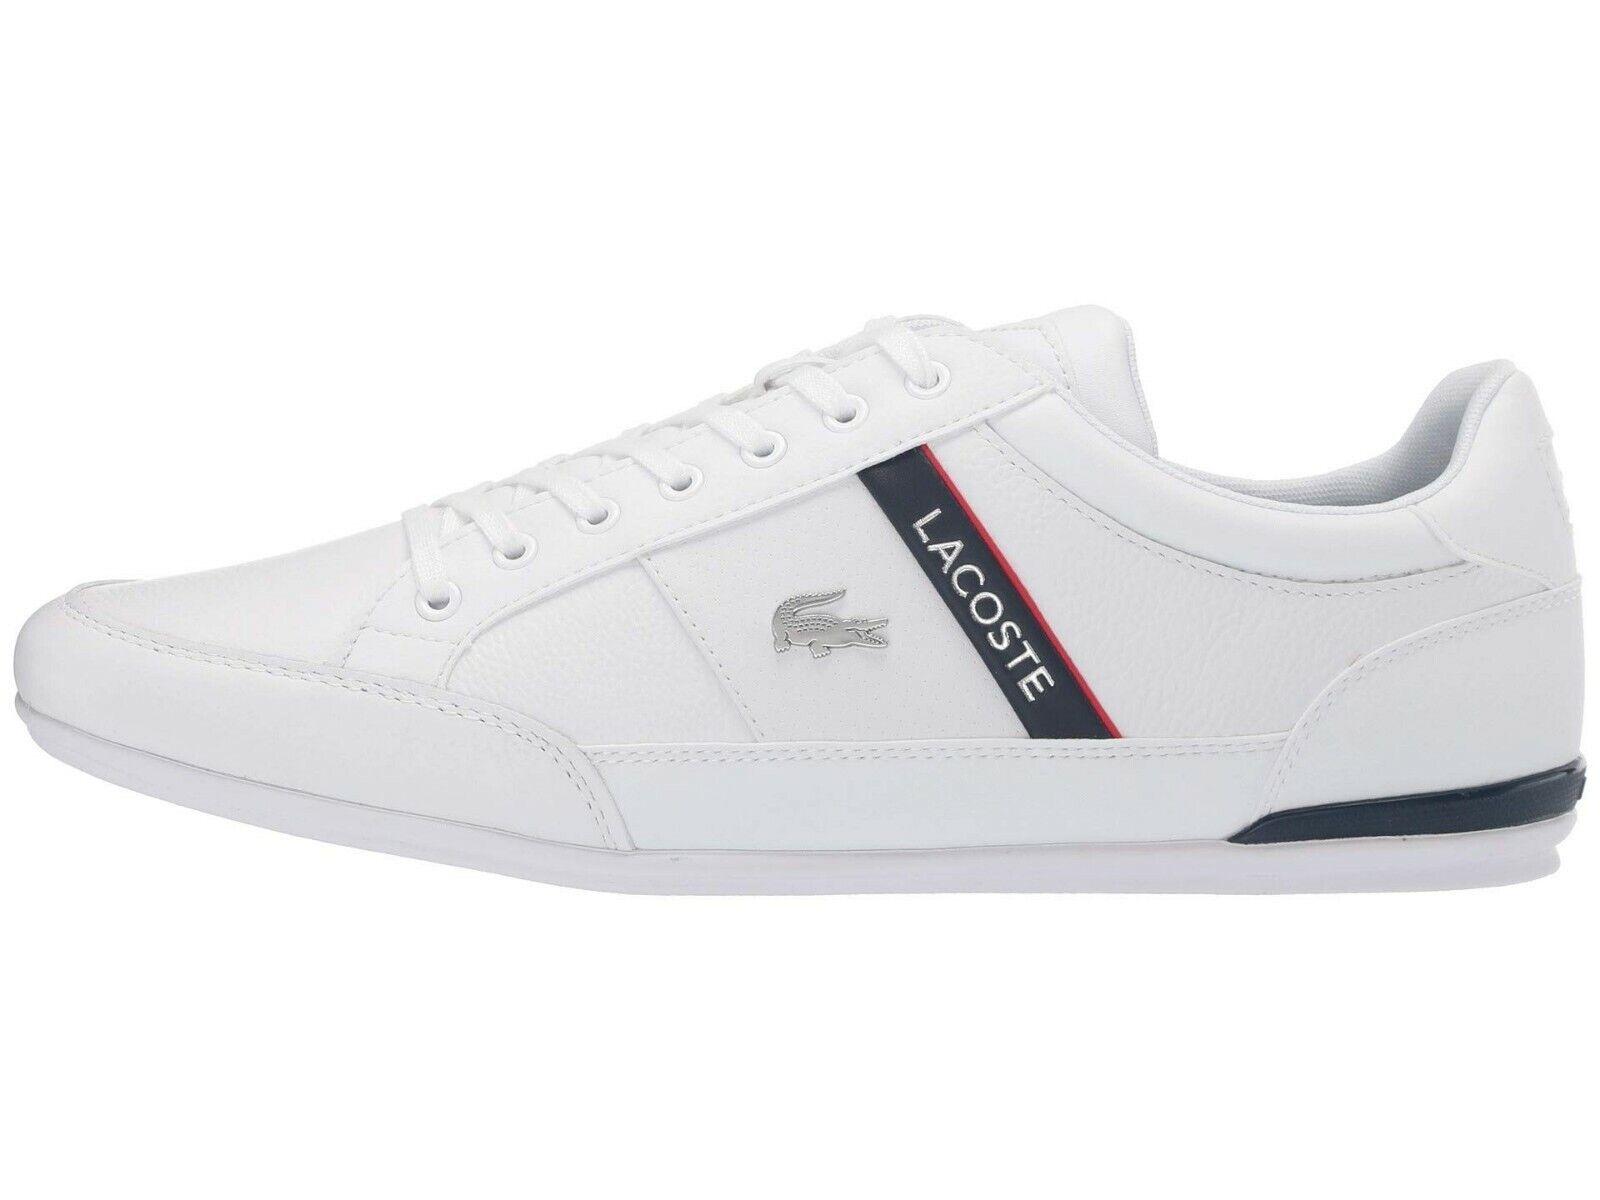 LACOSTE Chaymon 319 5 Croc Logo Leather Shoes Men's Fashion Sneakers White Navy